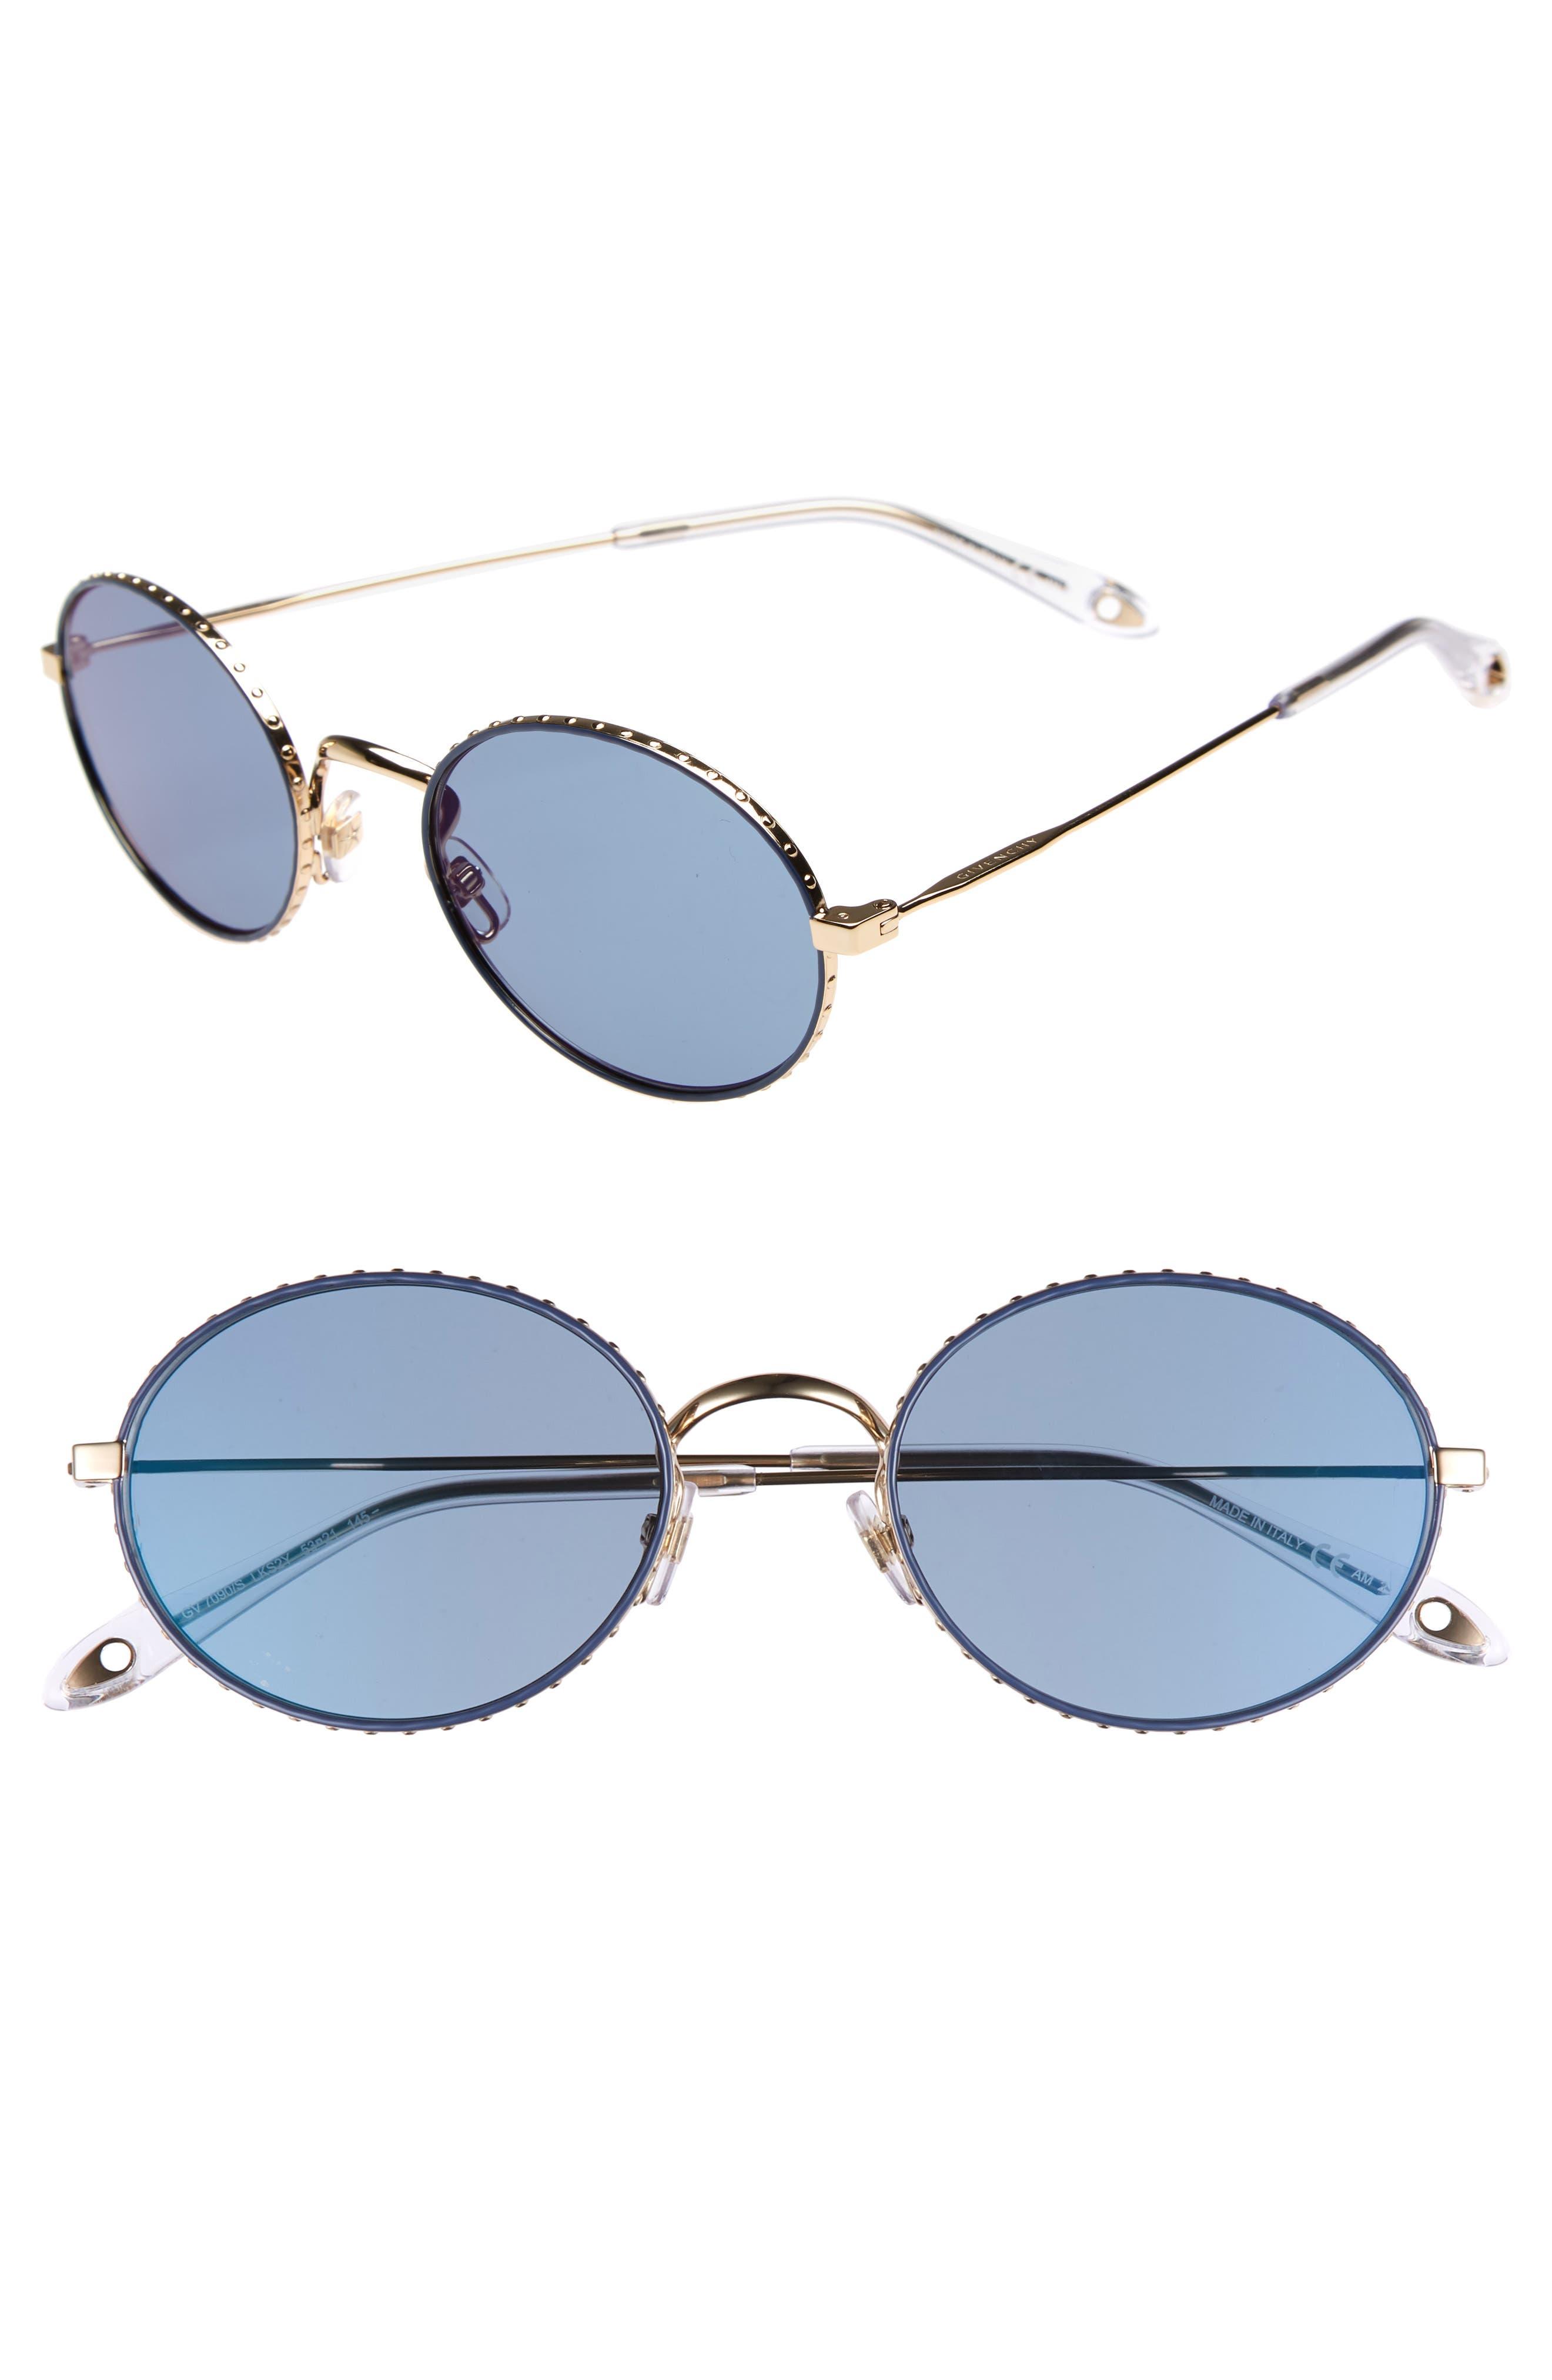 53mm Oval Sunglasses,                             Main thumbnail 1, color,                             GOLD/ BLUE